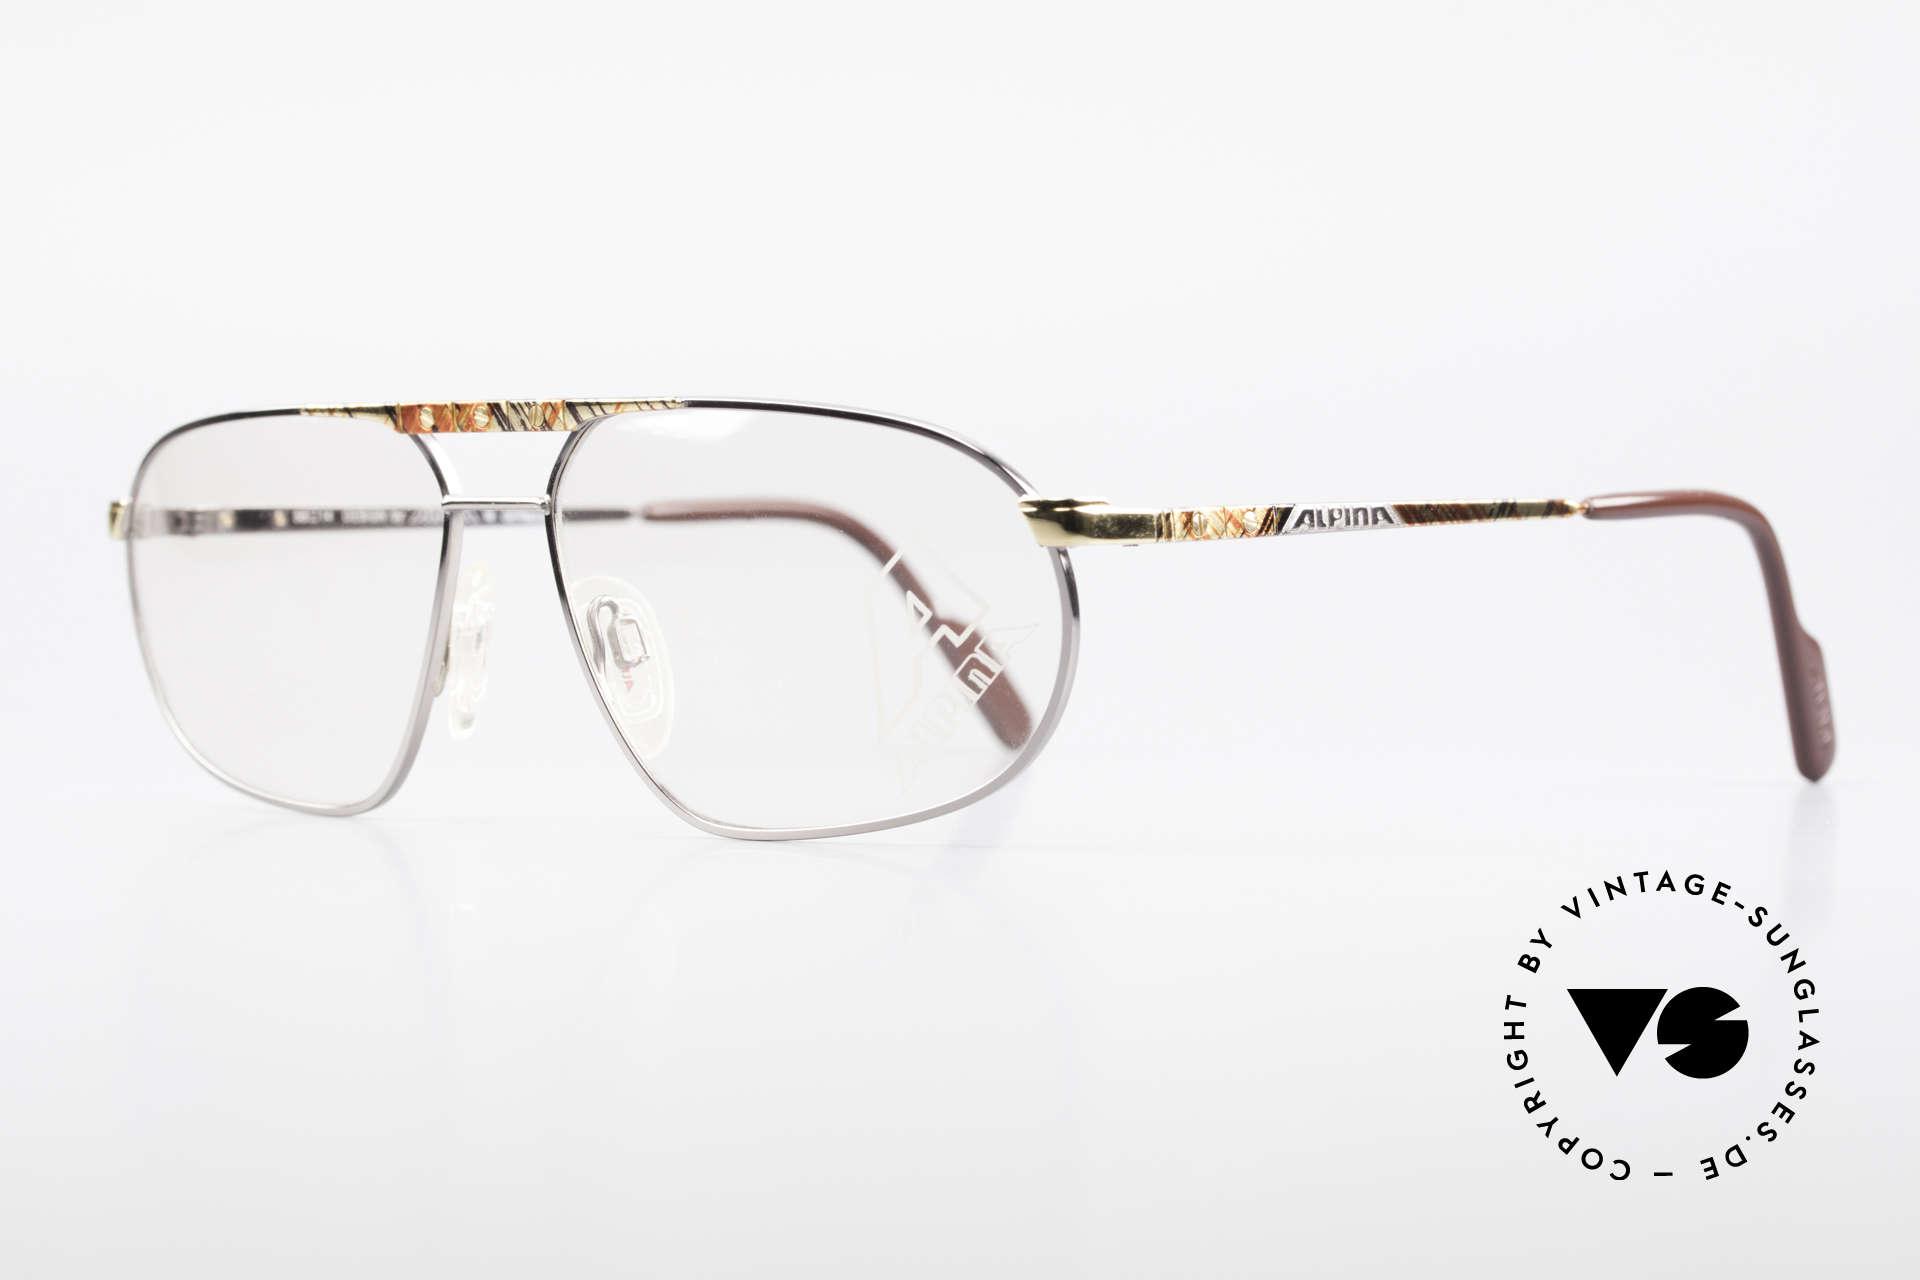 Alpina FM28 80's Designer Eyeglass-Frame, striking masculine design and 1st class comfort, Made for Men